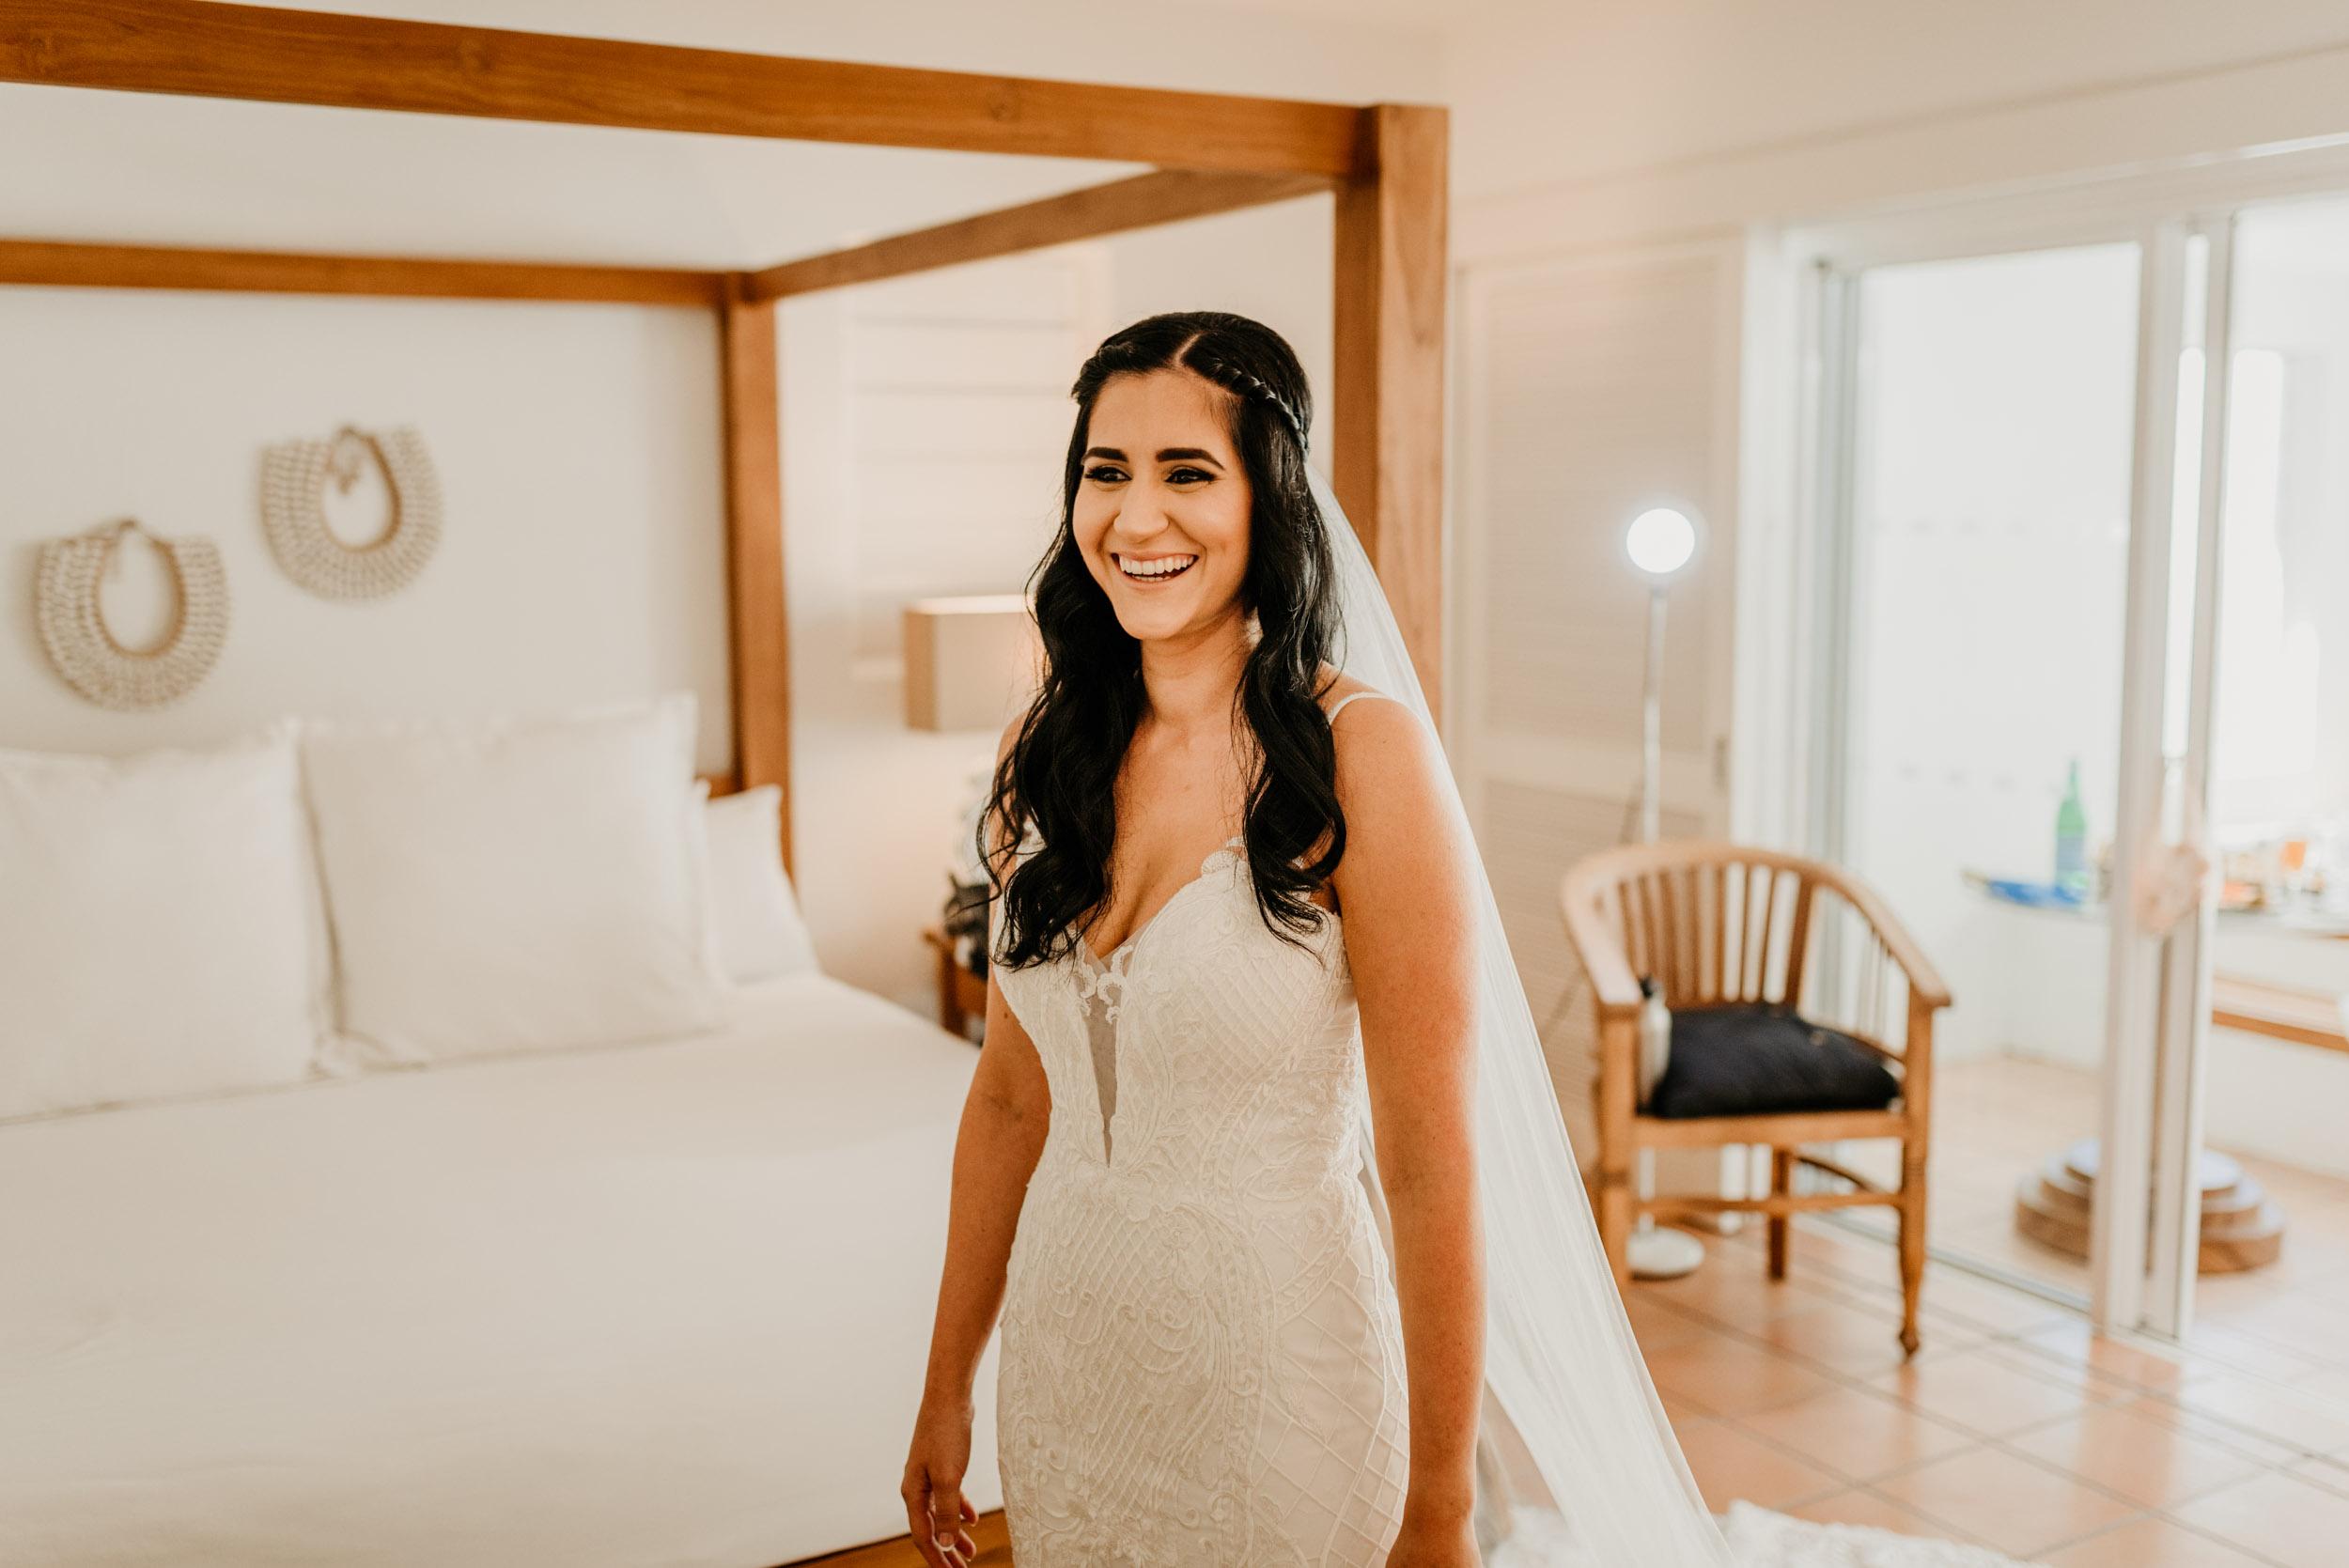 The Raw Photographer - Cairns Wedding Photographer - Beach Palm Cove Ceremony - Dress Irene Costa's Devine Bridal - Queensland-23.jpg